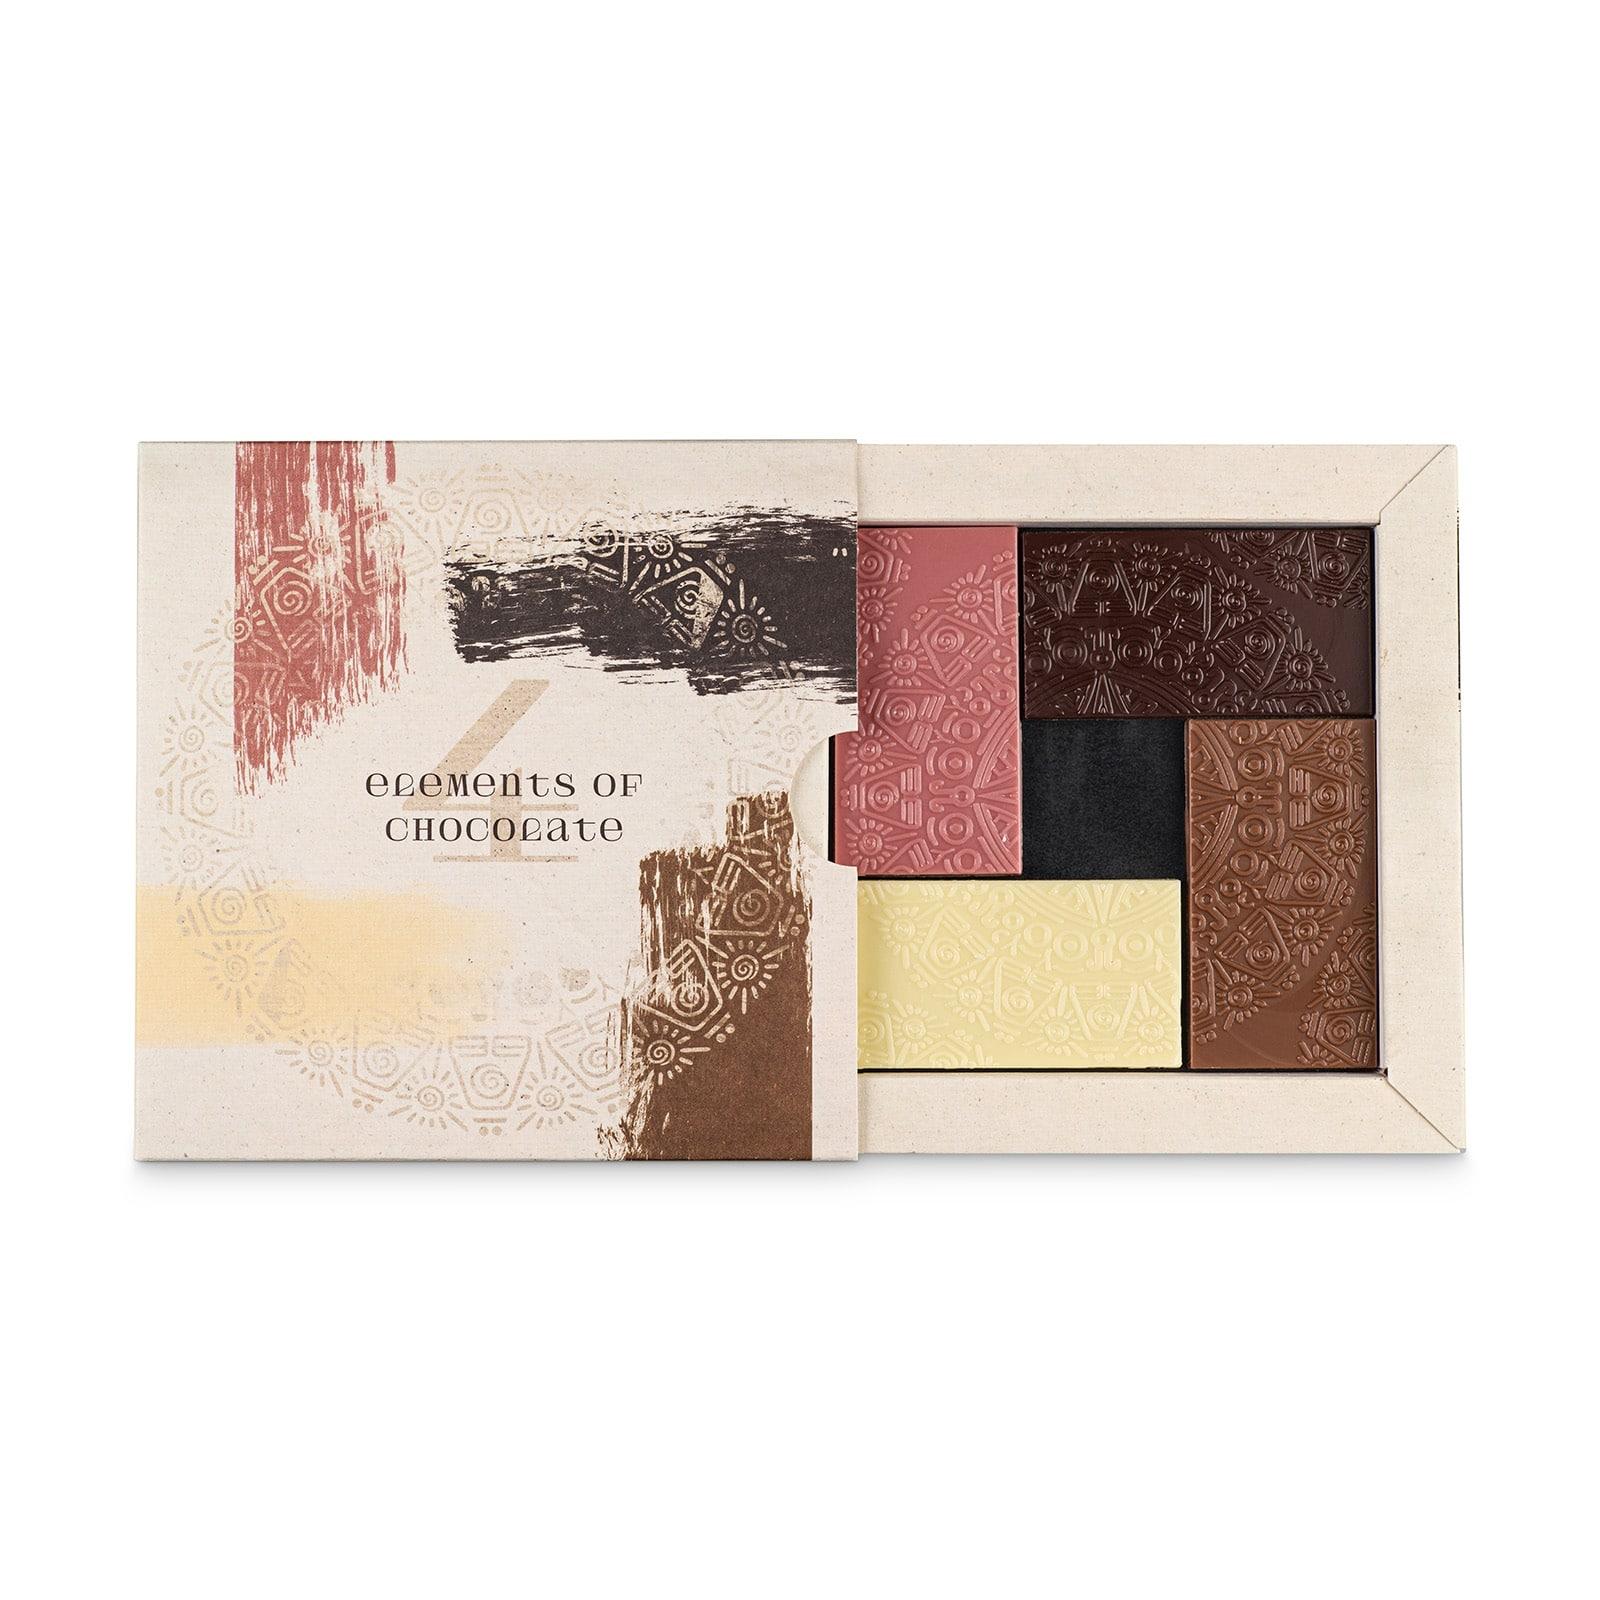 Schokoladen-Tasting Set mit Ruby Schokolade '4 Elements of Chocolate'